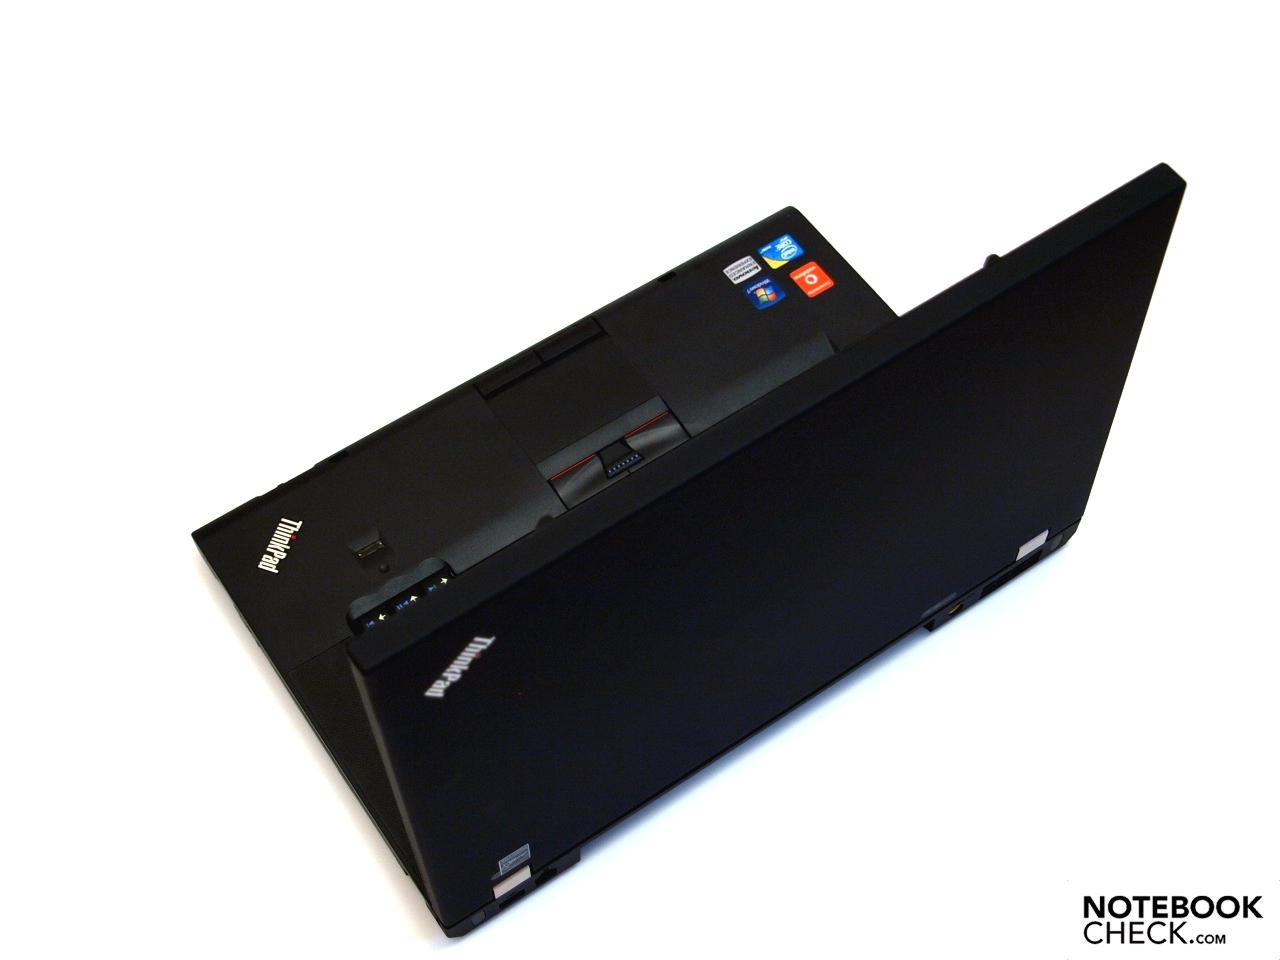 Review Lenovo ThinkPad T510 Notebook (Optimus) - NotebookCheck net